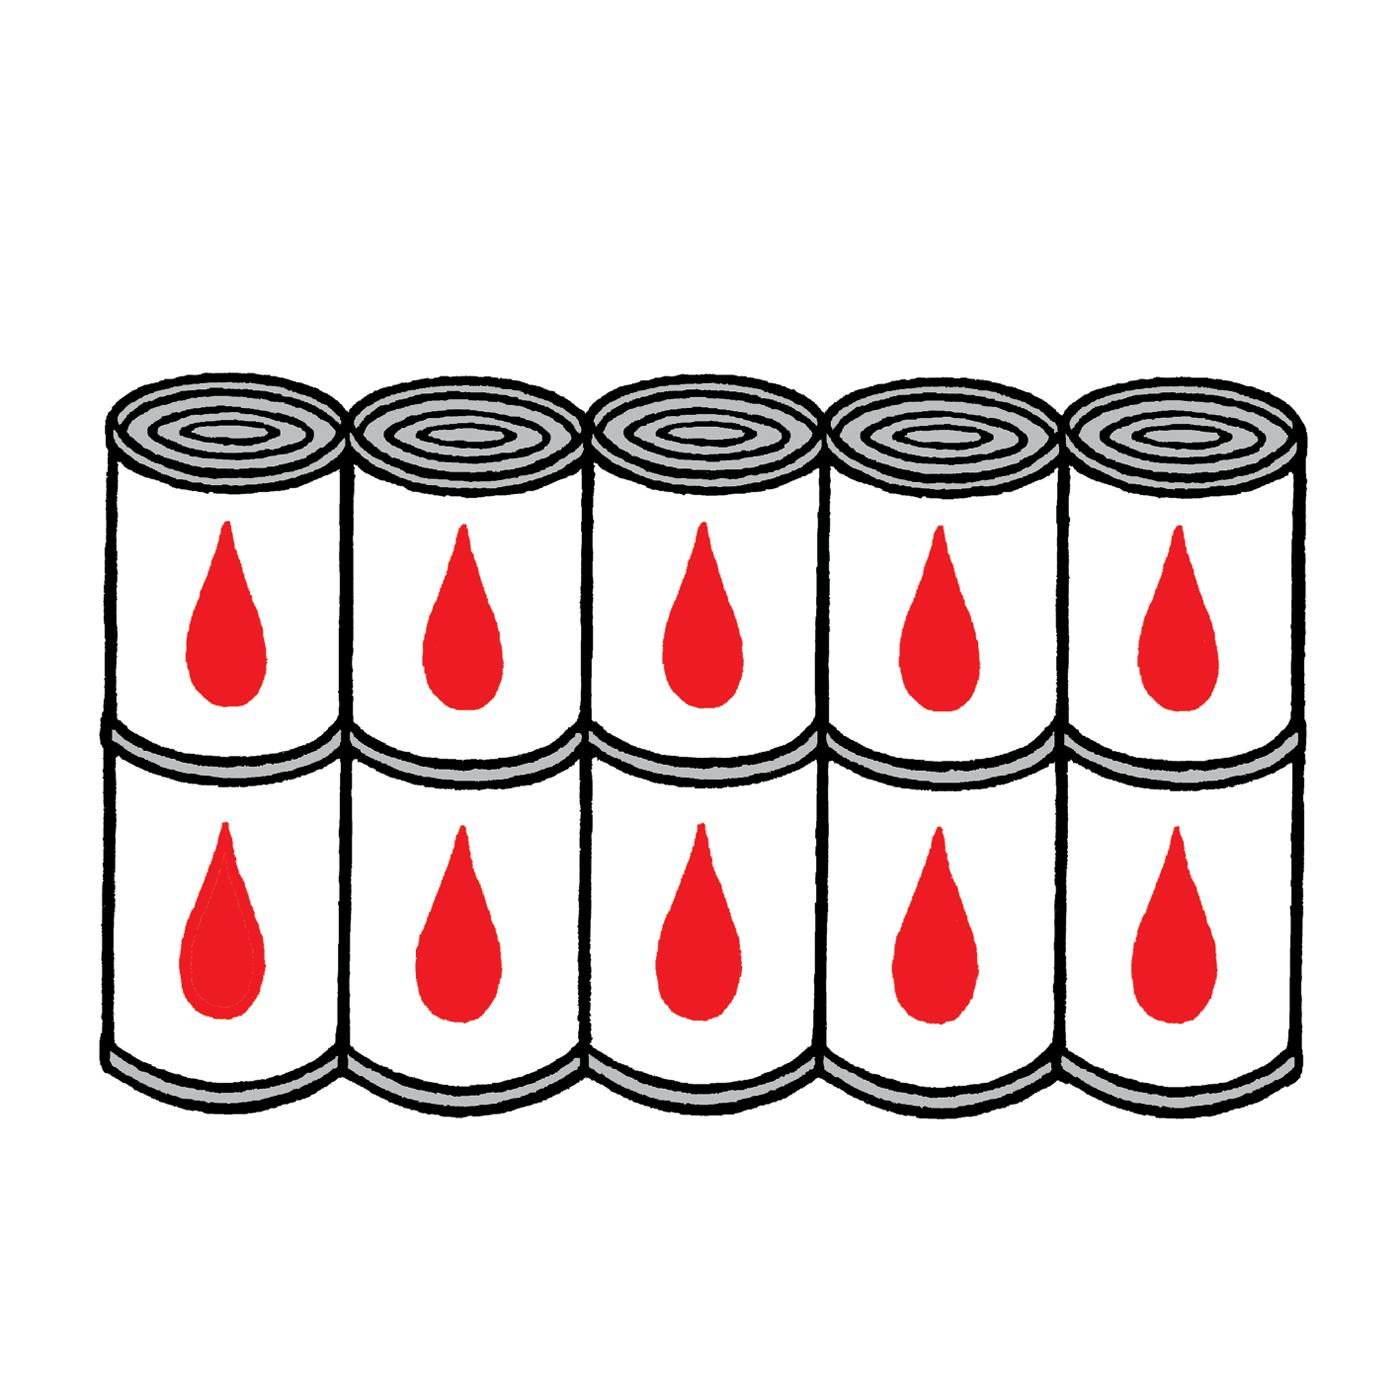 Konserverat-blod